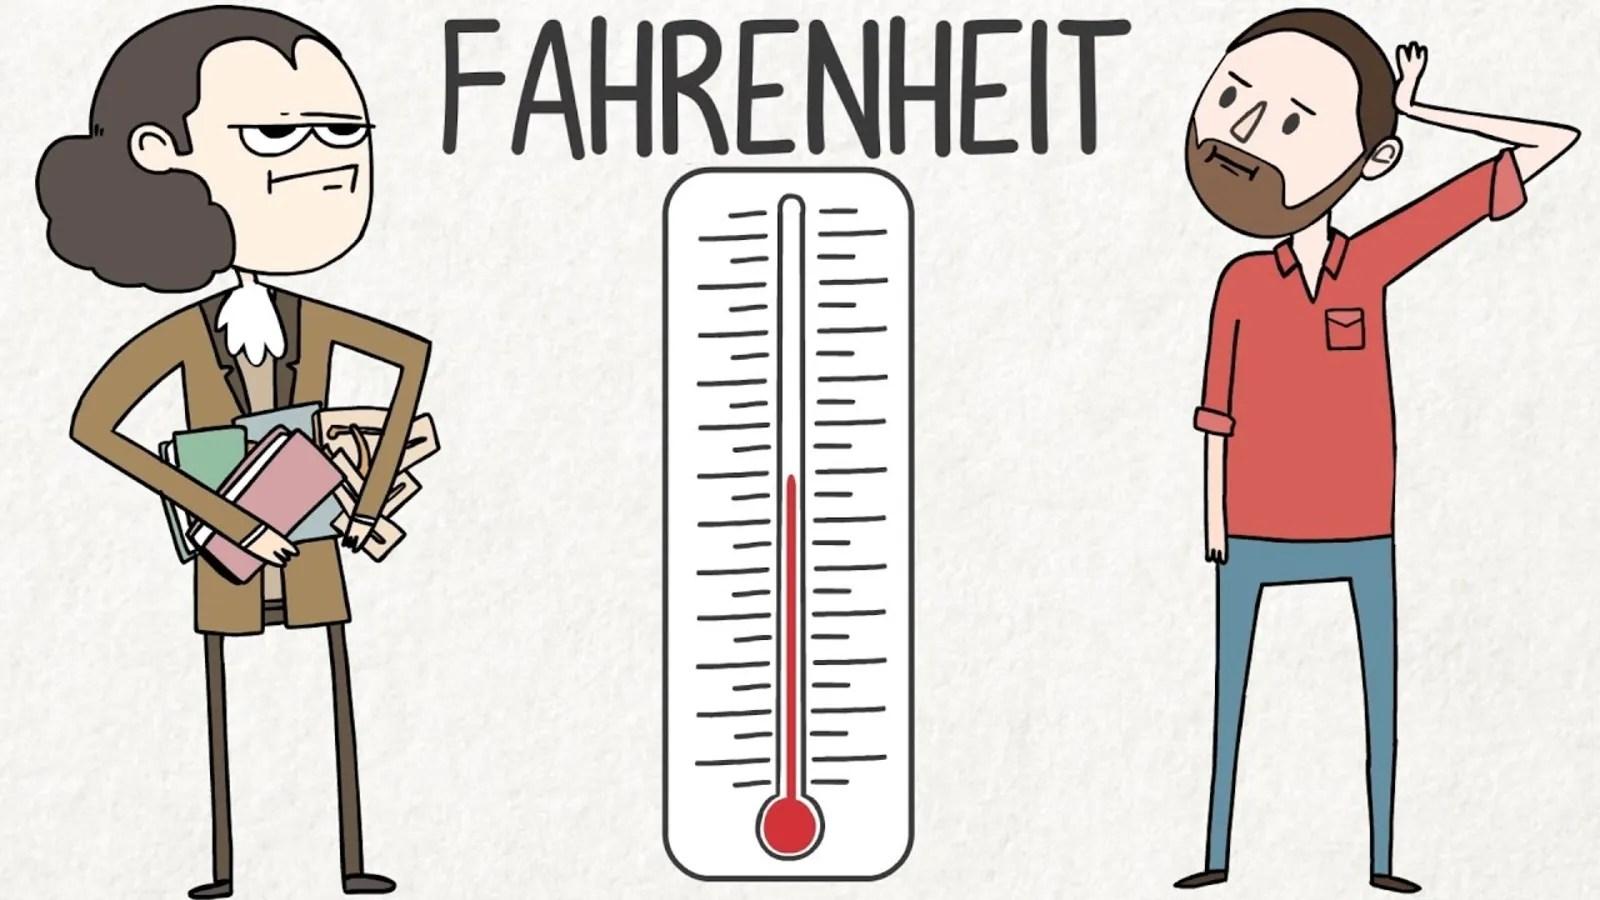 Why The Fahrenheit Temperature Scale Makes So Little Sense